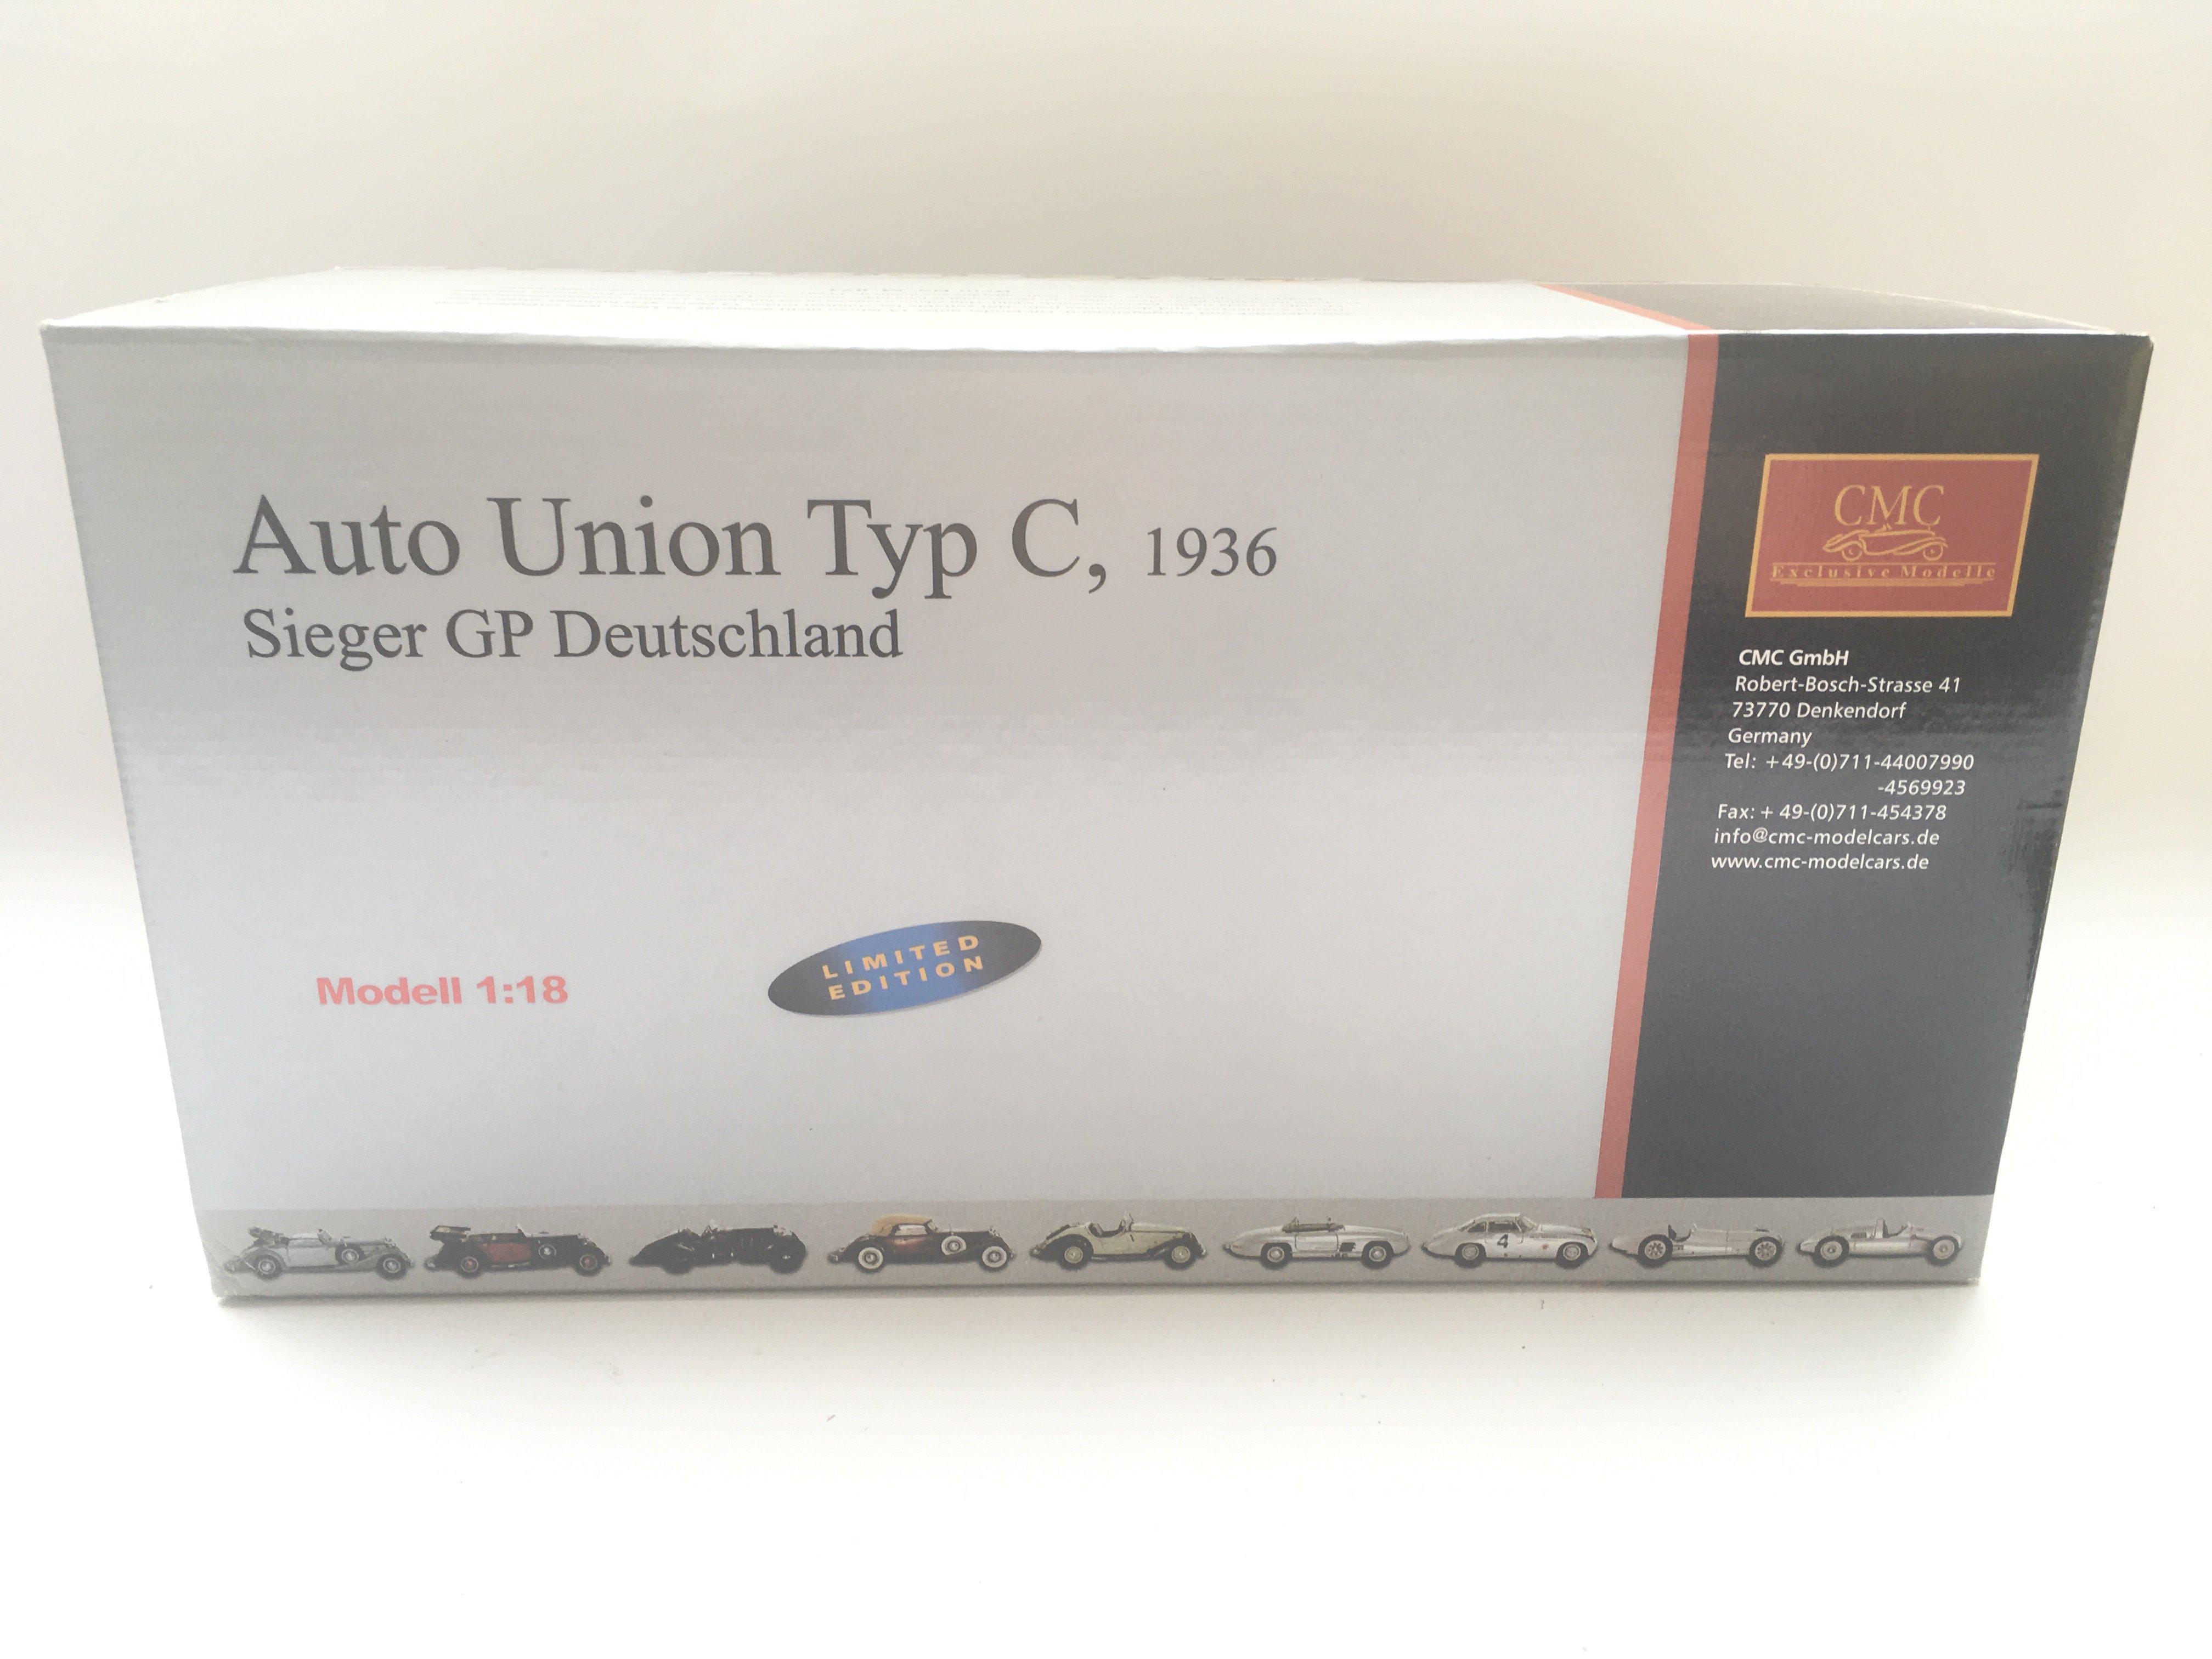 A CMC Exclusive Models Auto Union Type C Sieger GP - Image 3 of 3